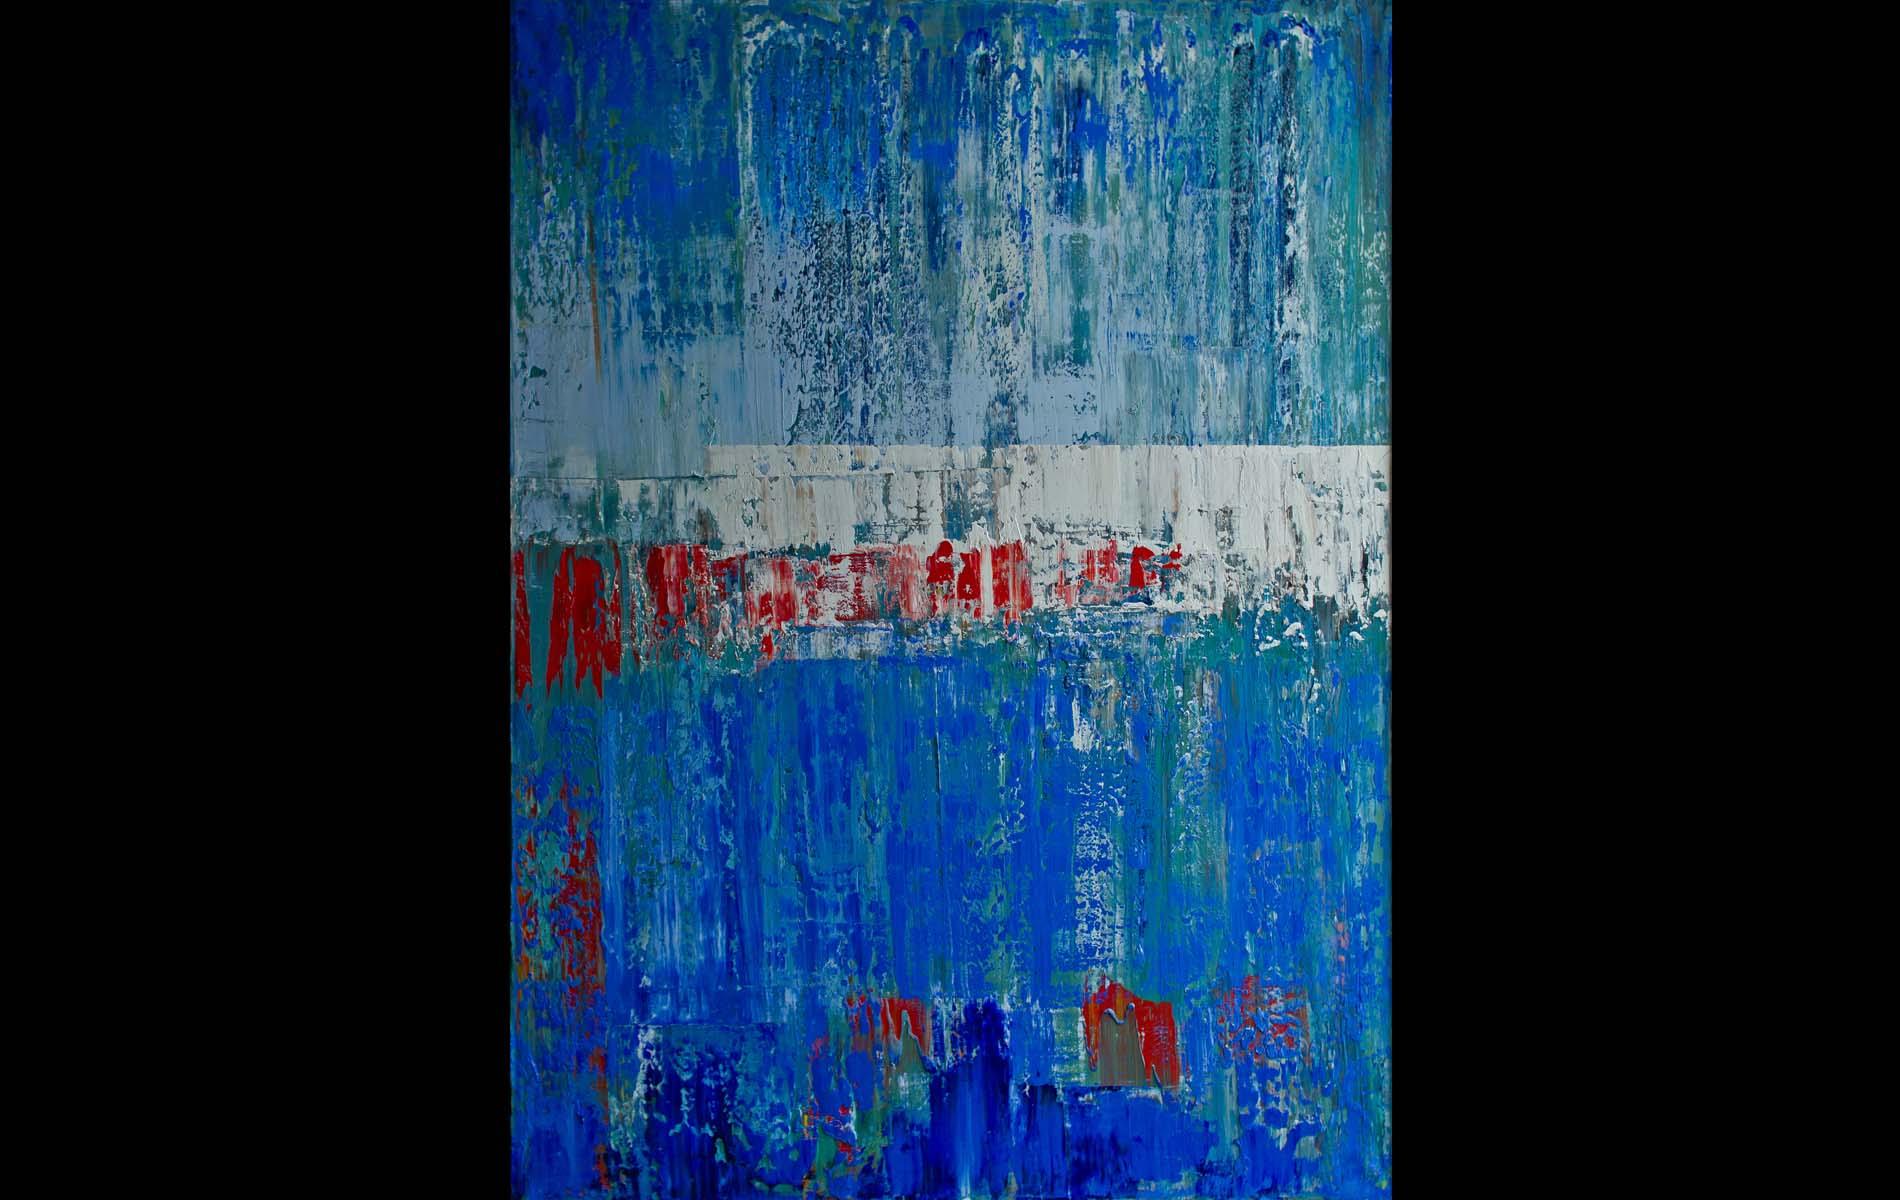 Trawlers, 2013, Oil on Canvas, 68 x 40